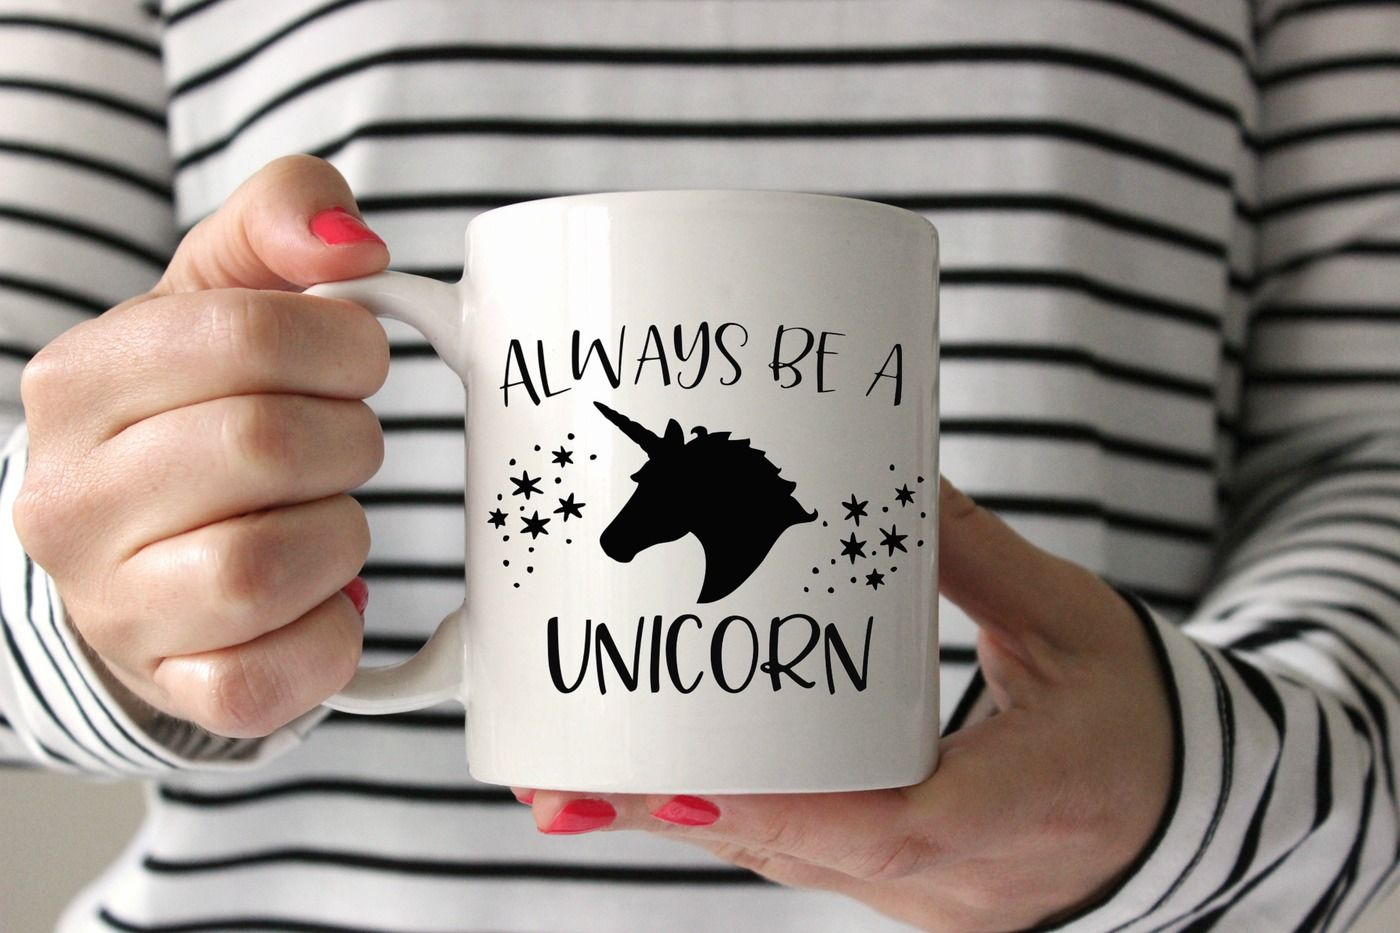 Always Be A Unicorn Svg Dxf Eps Png Cut File Cricut Silhouette